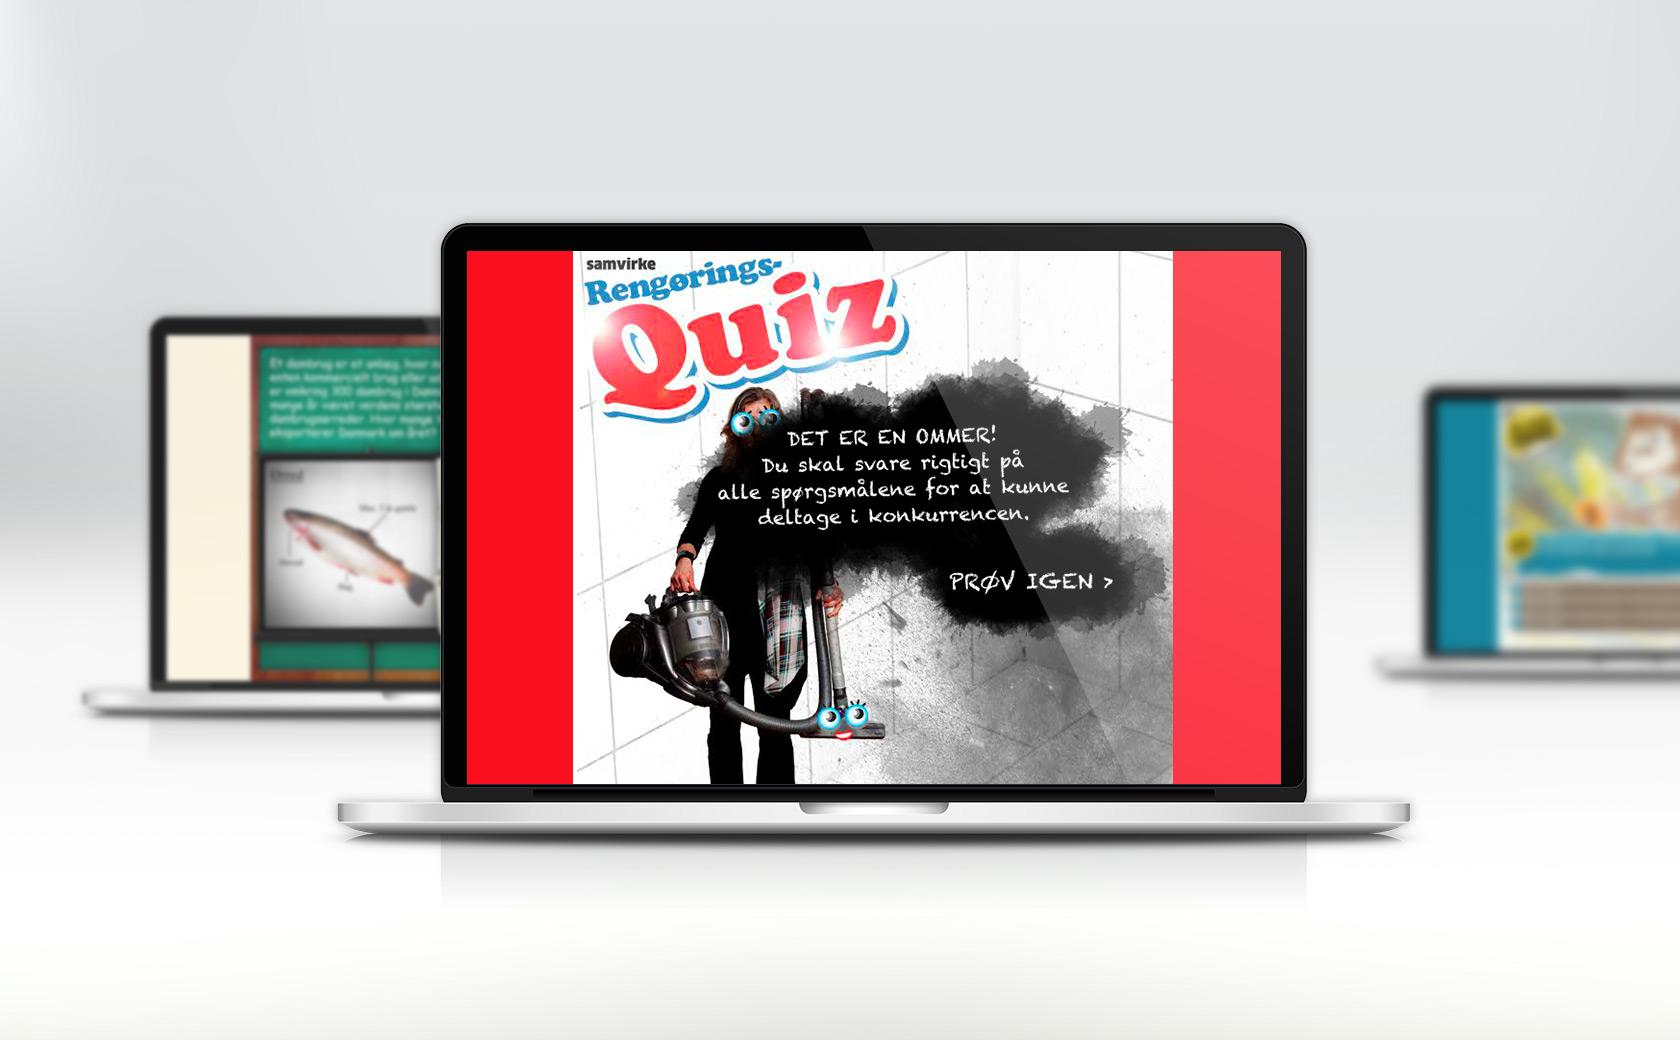 Samvirke quizzer